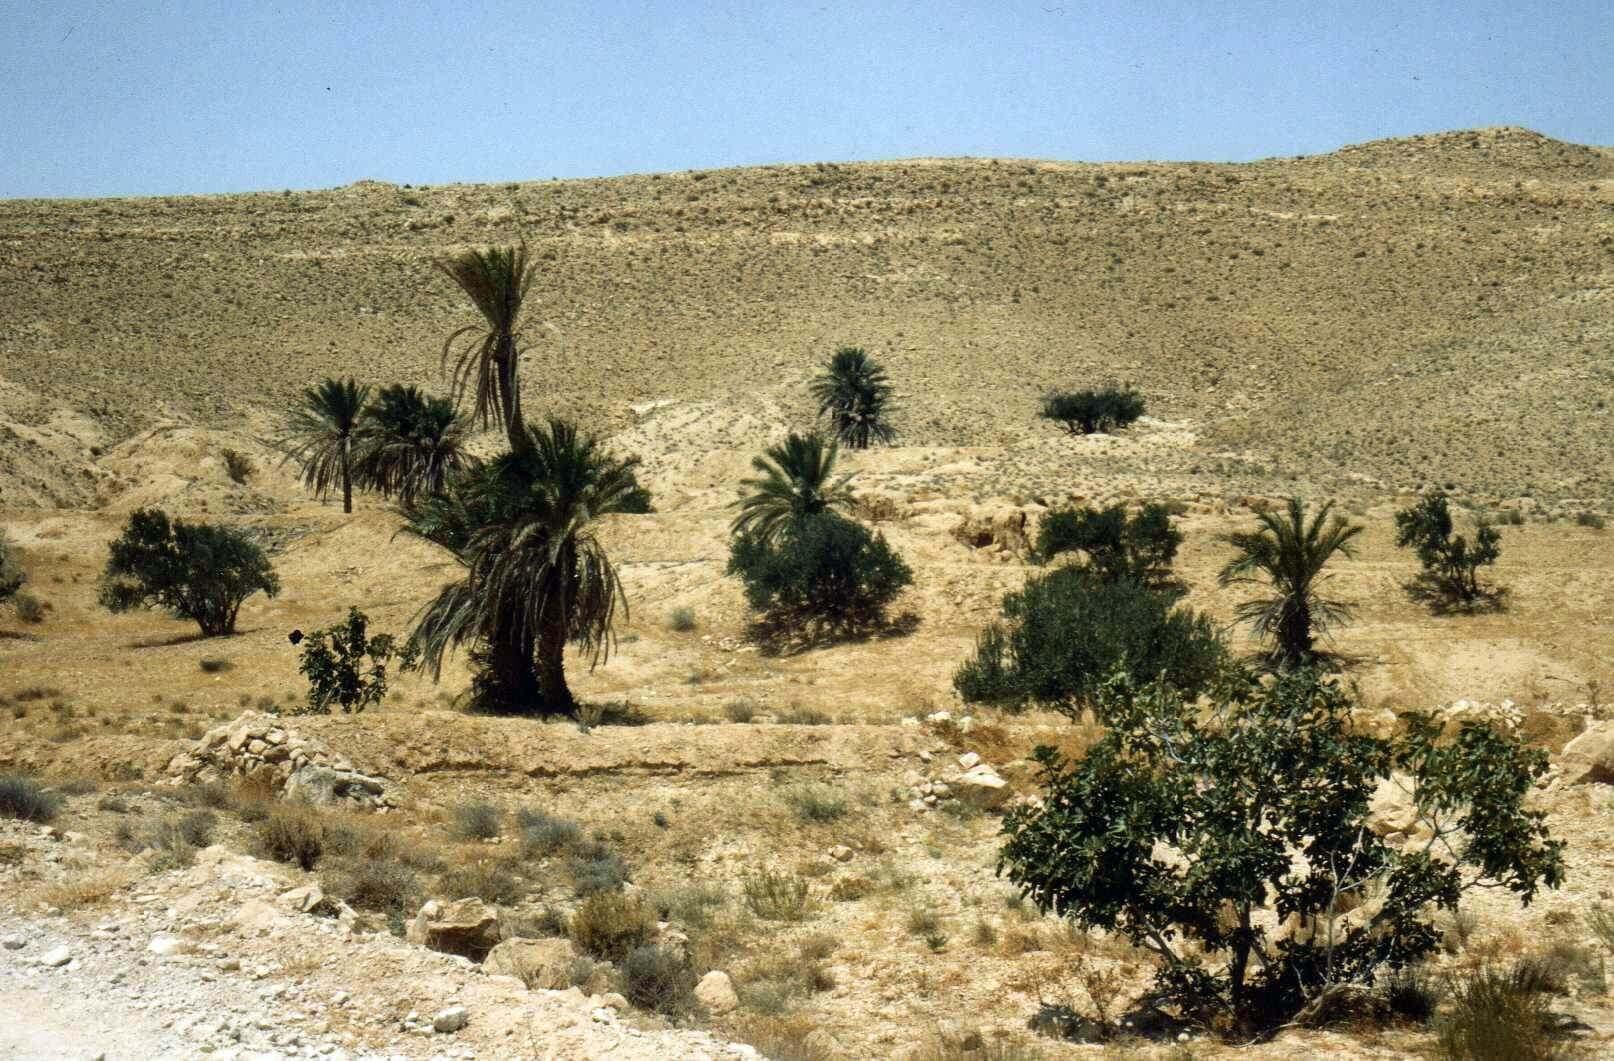 Raid moto 4x4 Tunisie Wild Spot Gabes Matmata